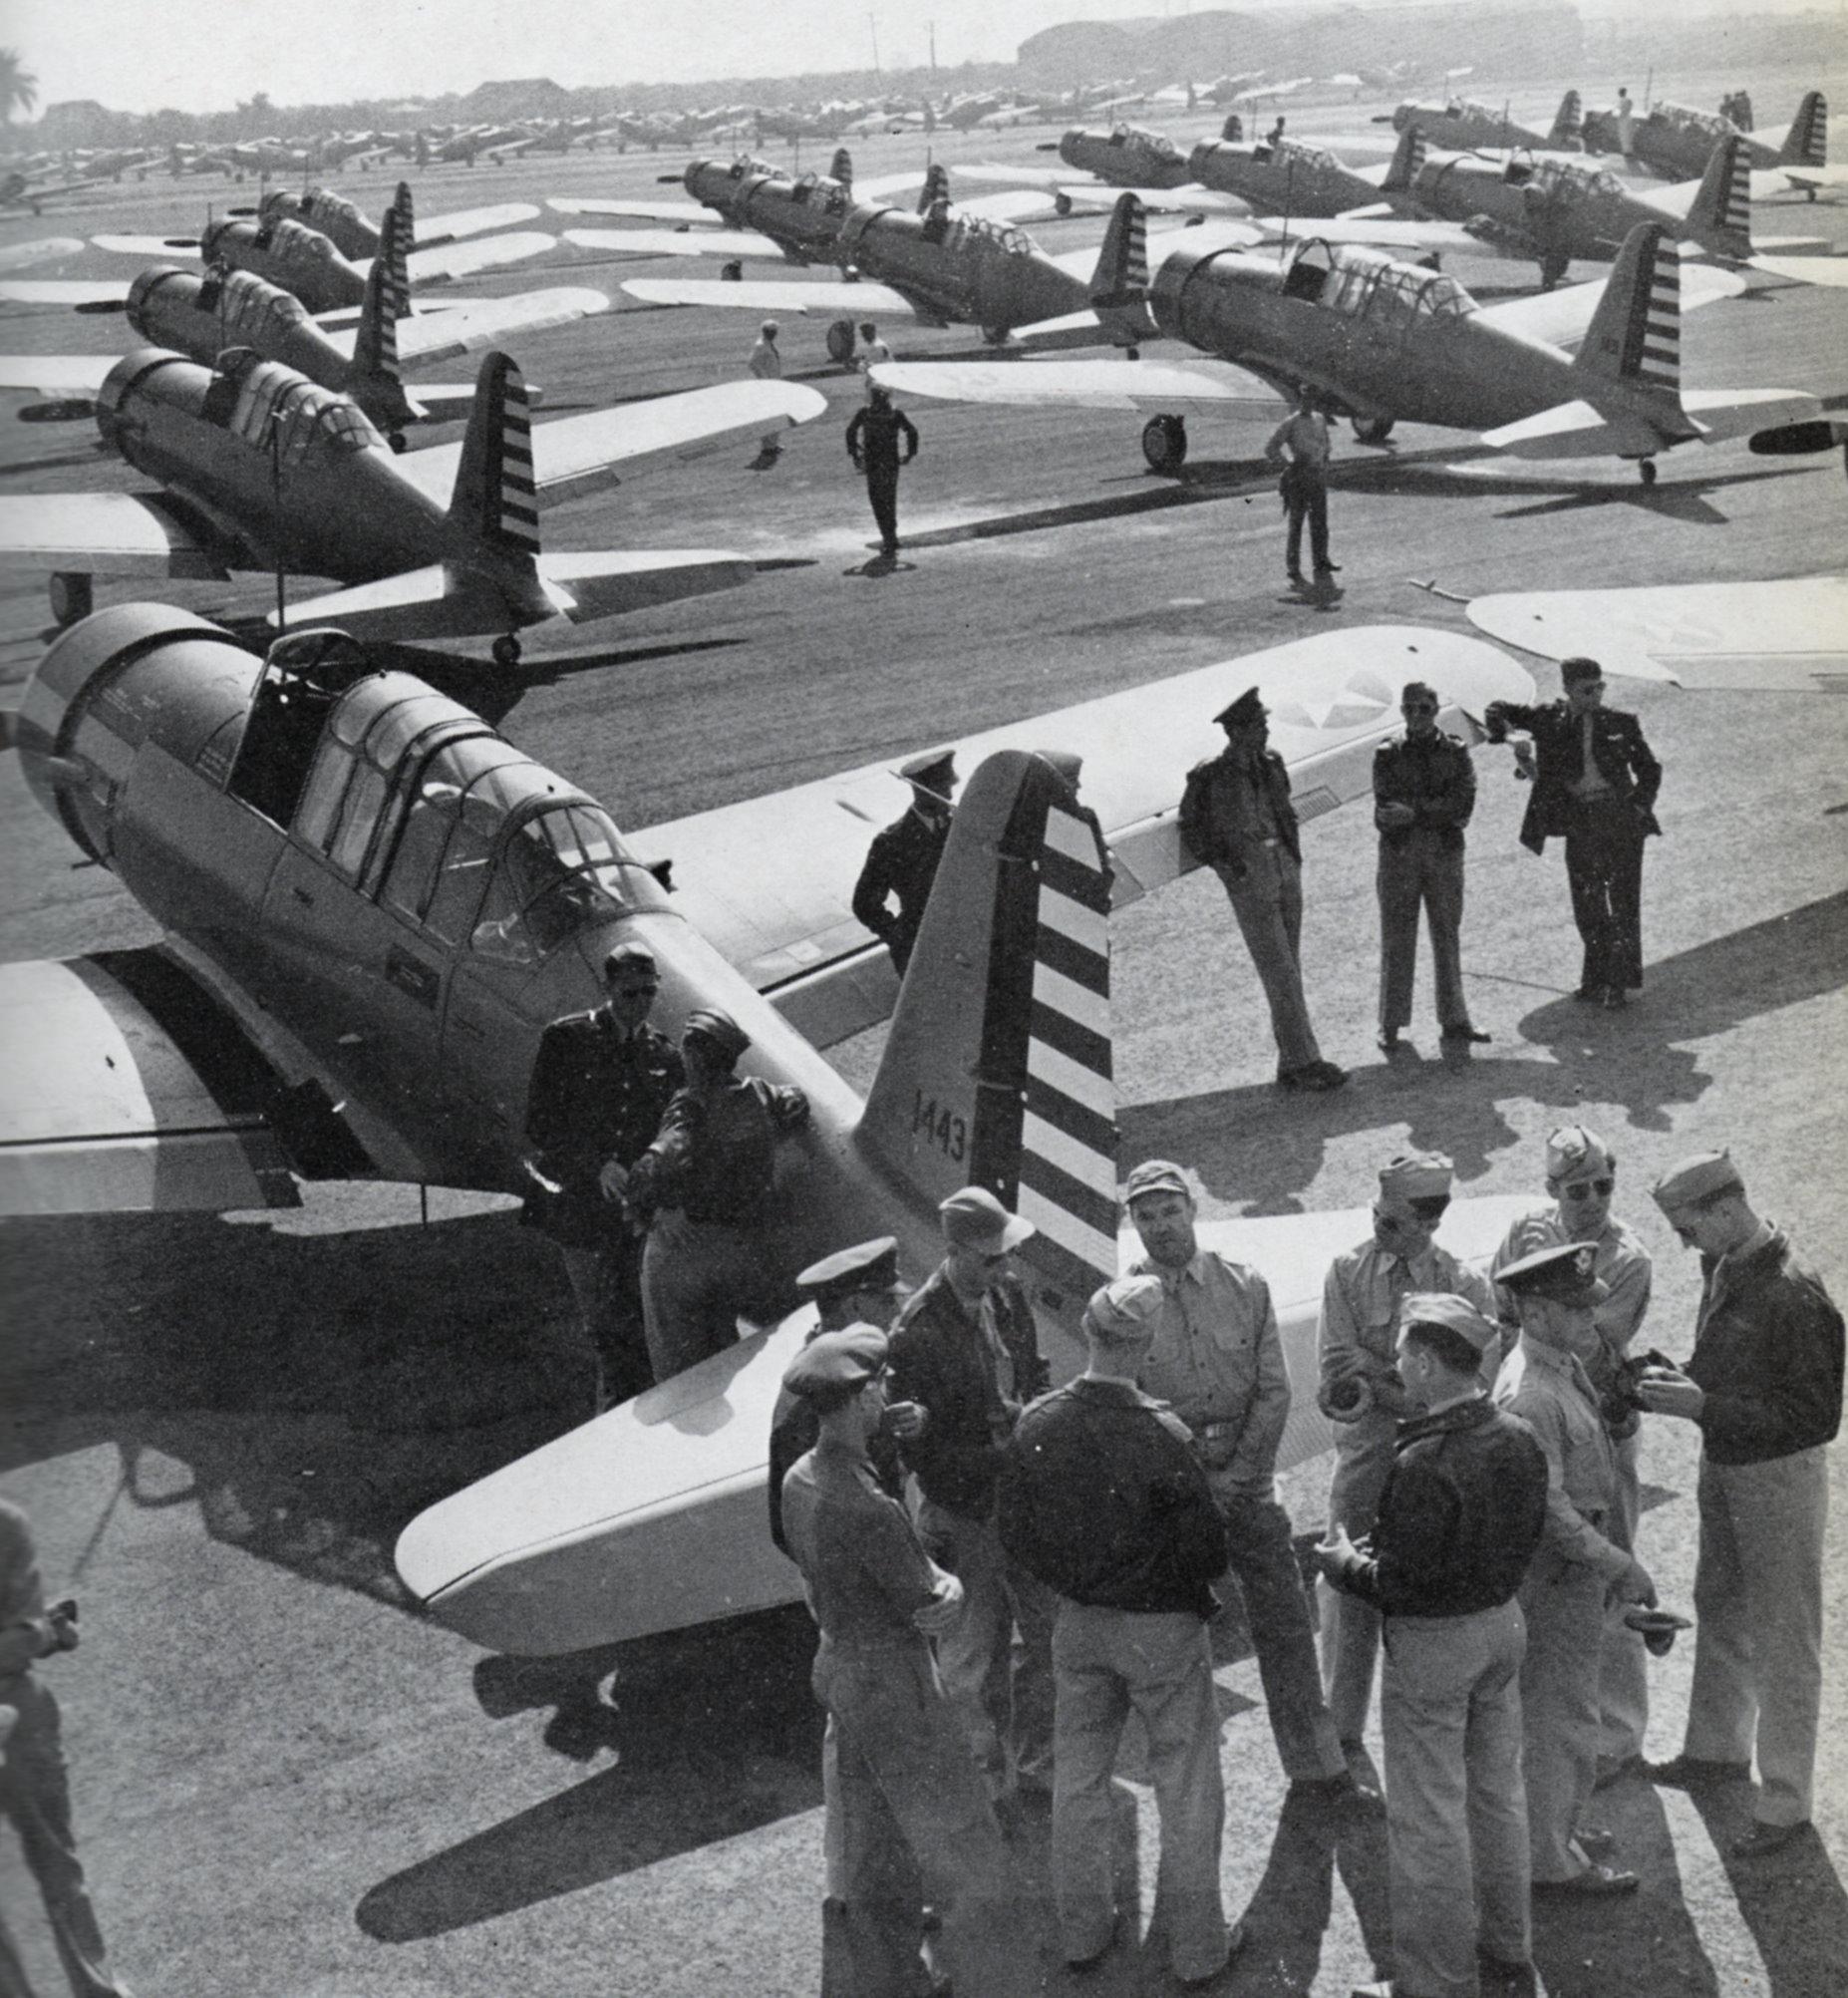 Vultee trainer Aircraft